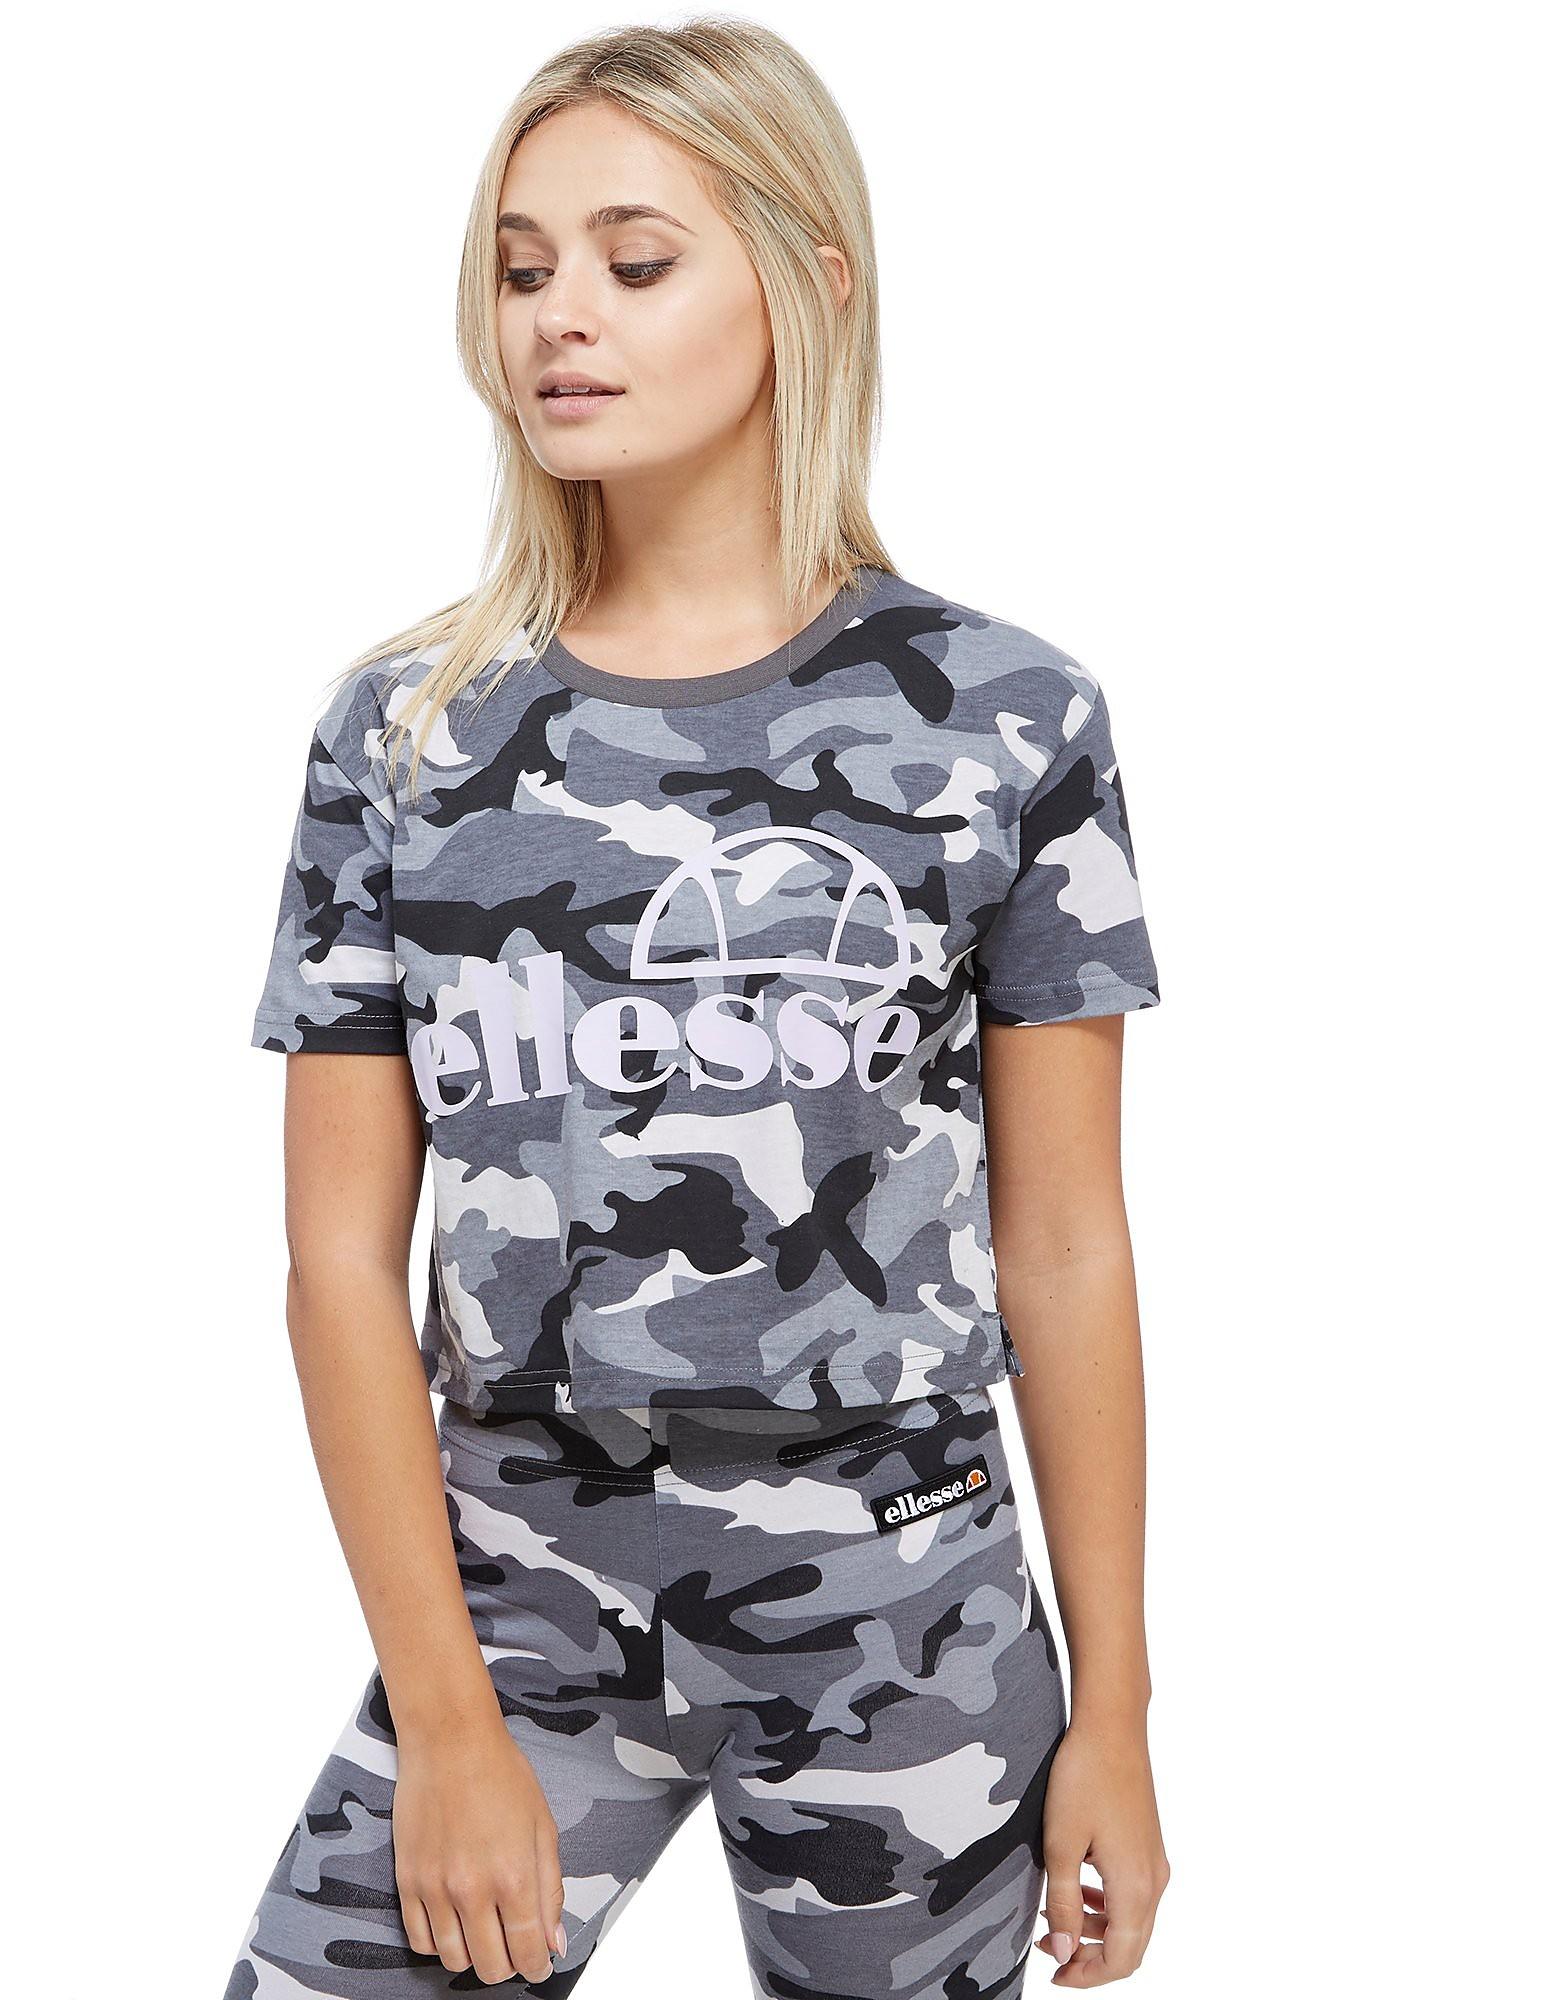 Ellesse T-shirt Camo Cropped Femme